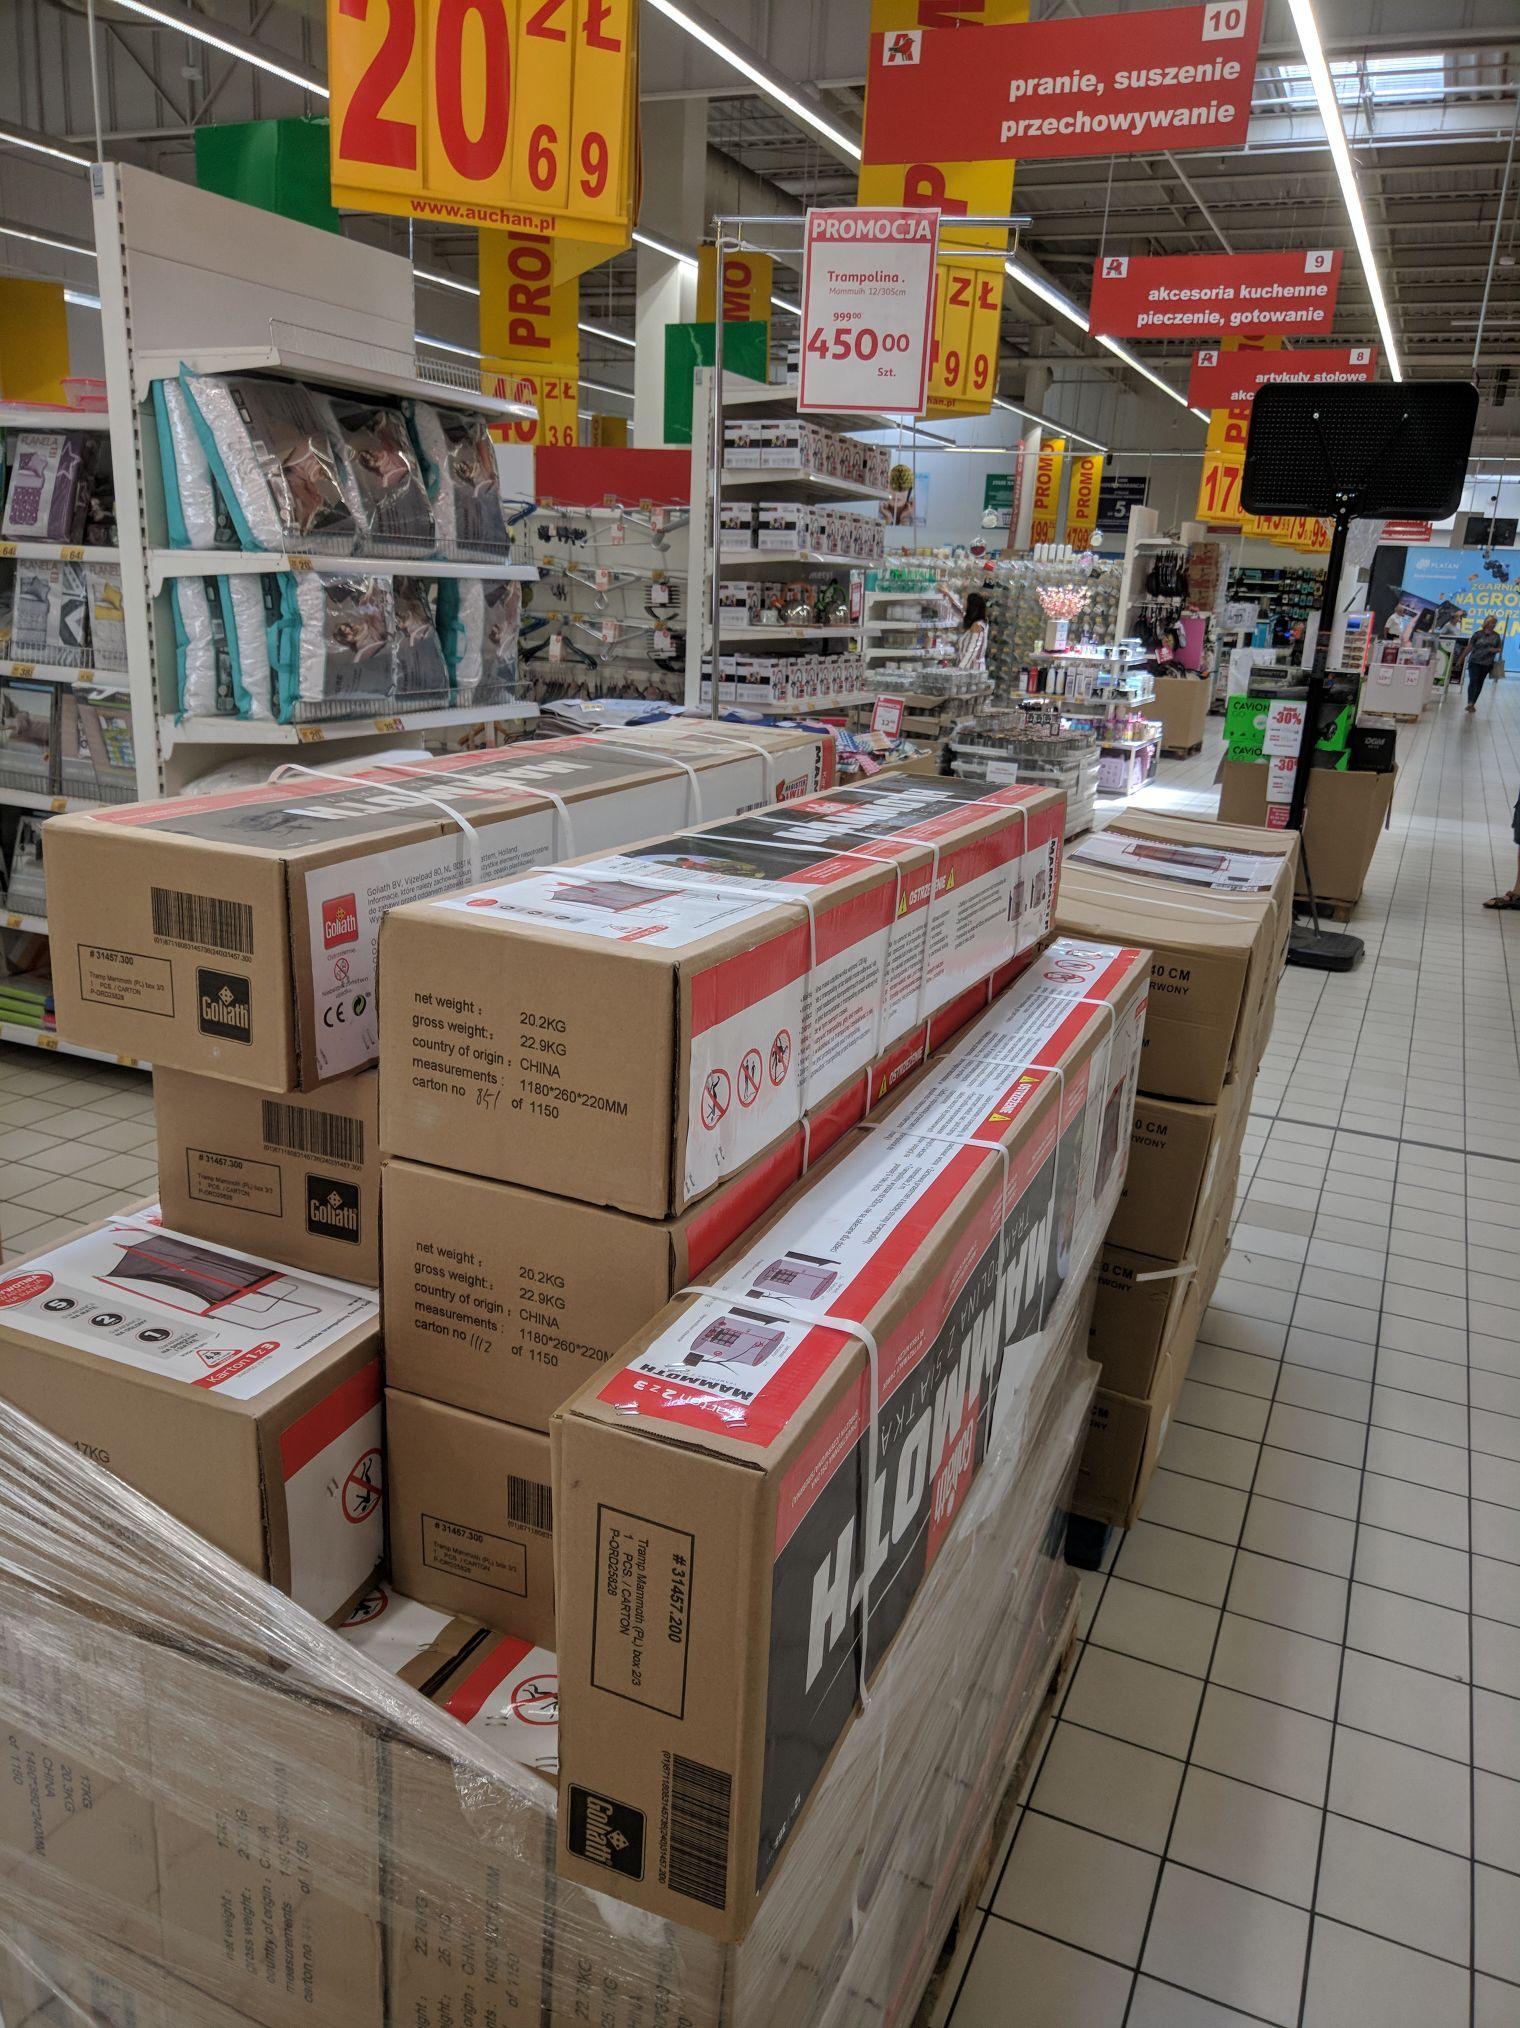 Trampolina Mammoth Goliath 365cm , Auchan Zabrze Platan